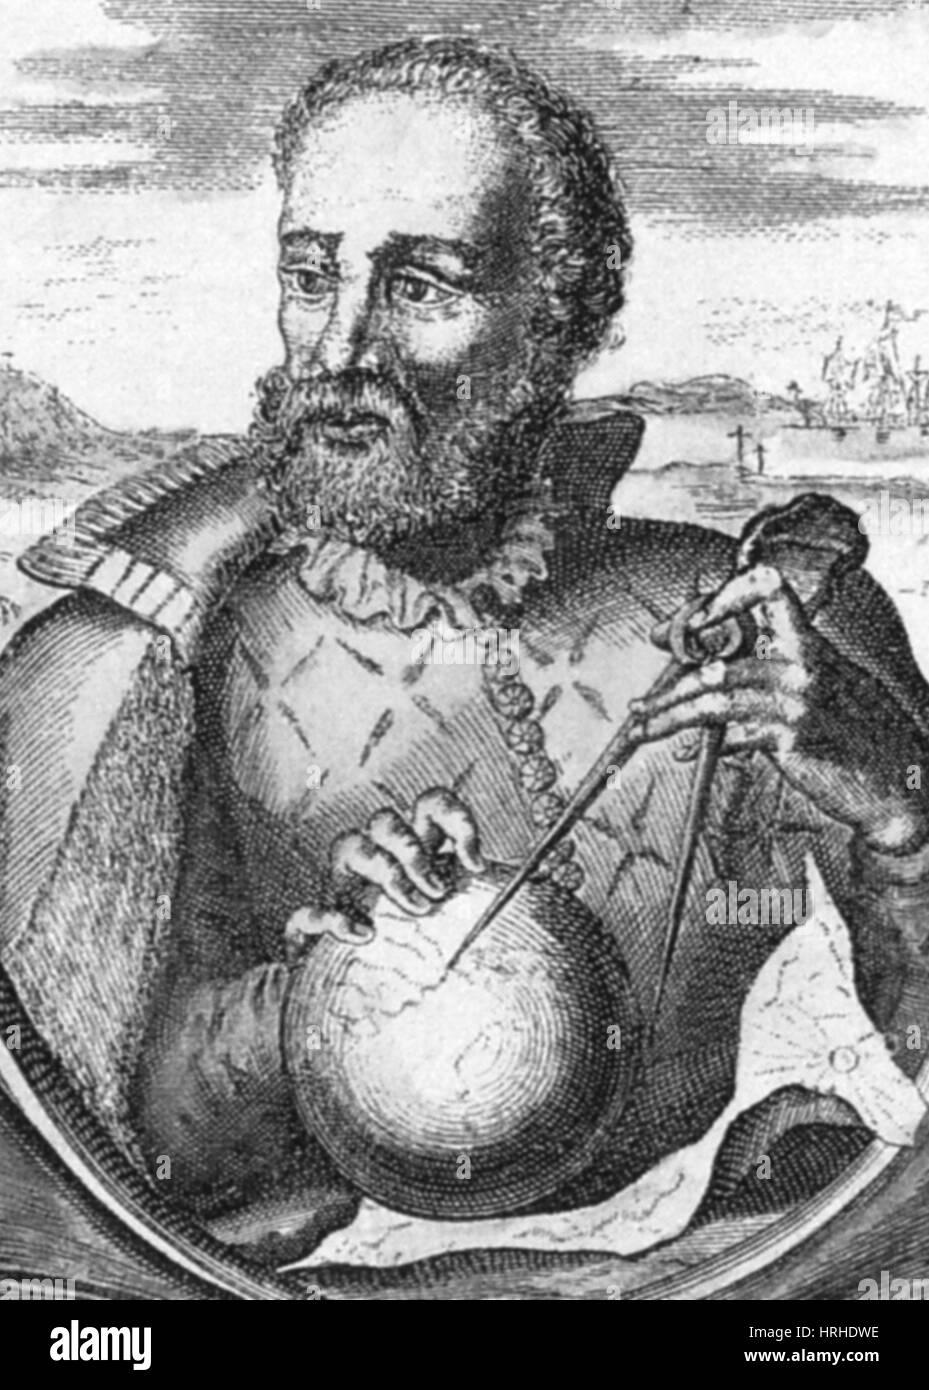 Ferdinand Magellan, Portuguese Explorer - Stock Image